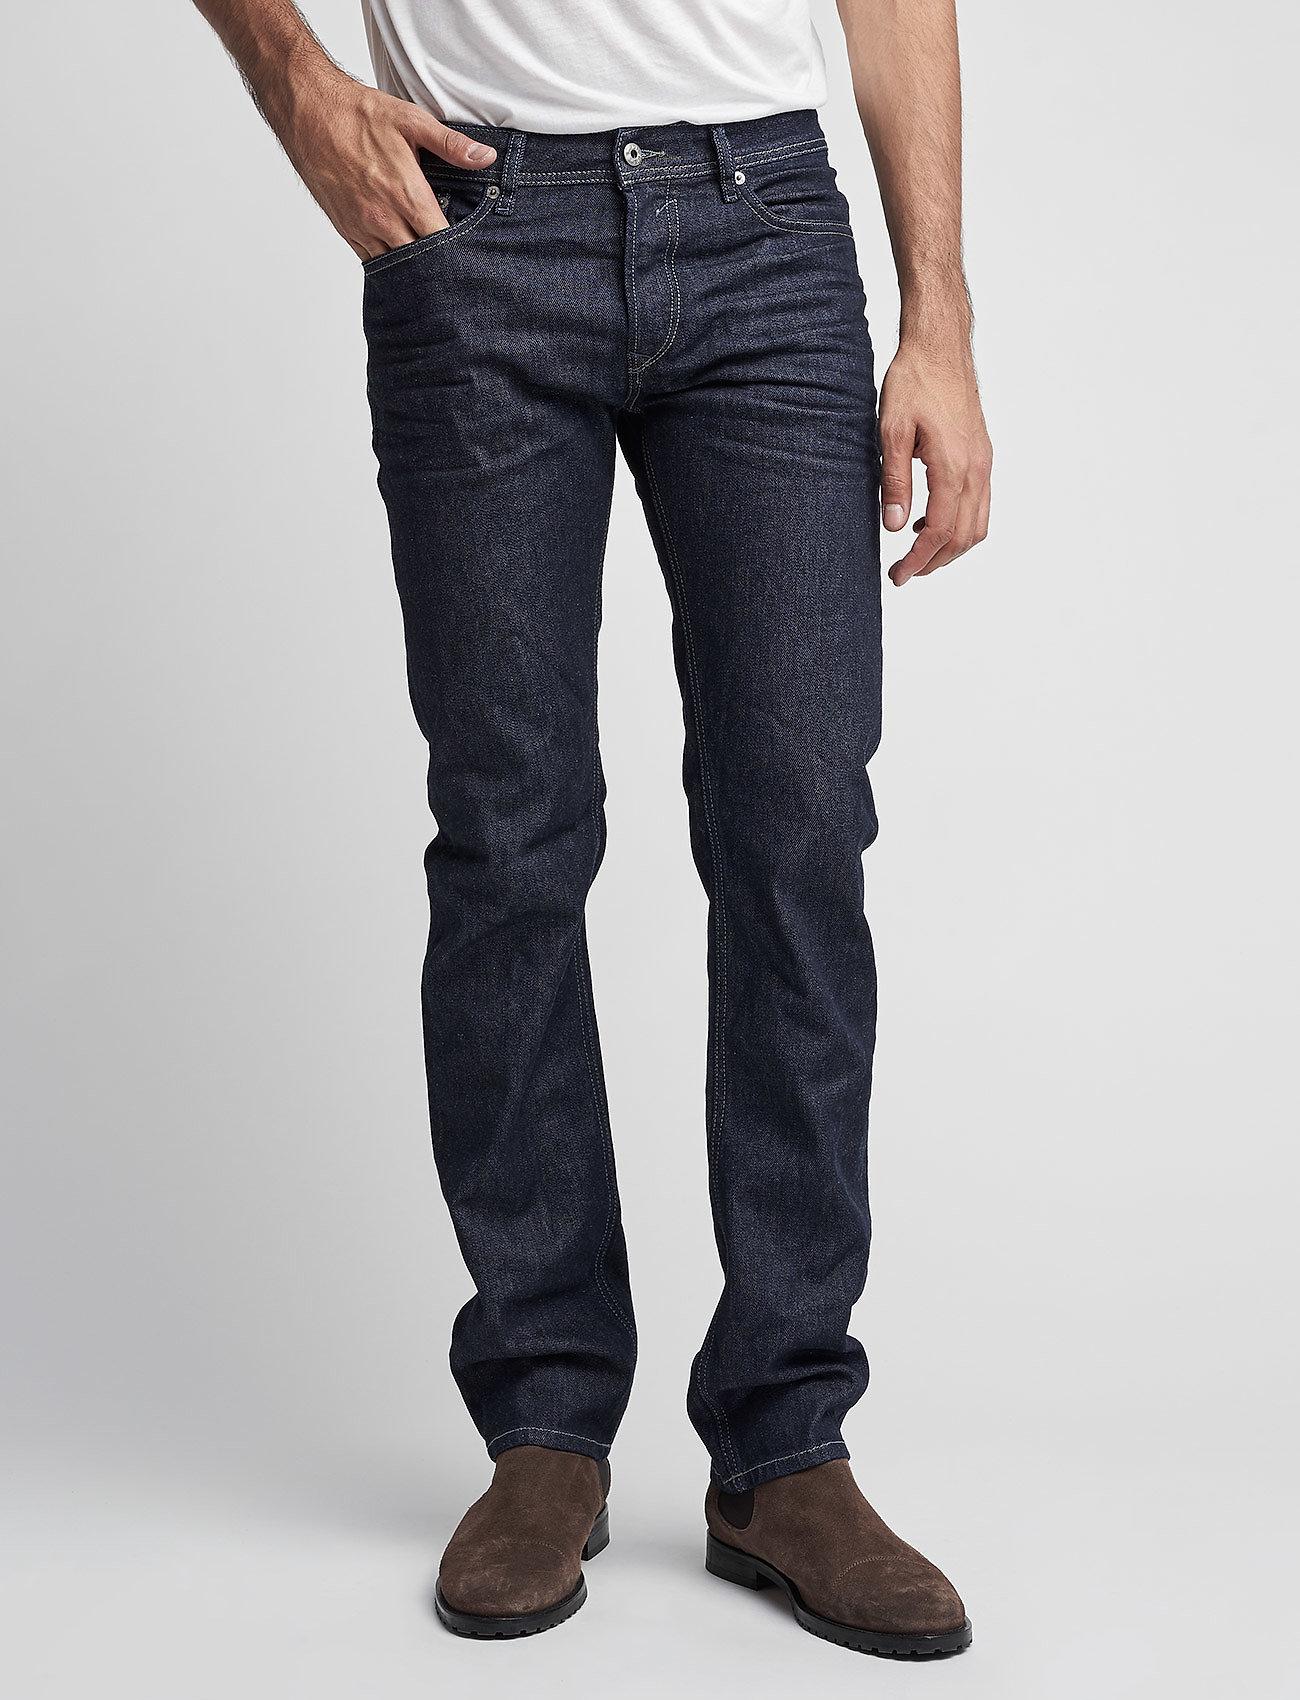 Diesel Men - WAYKEE TROUSERS - regular jeans - denim - 0